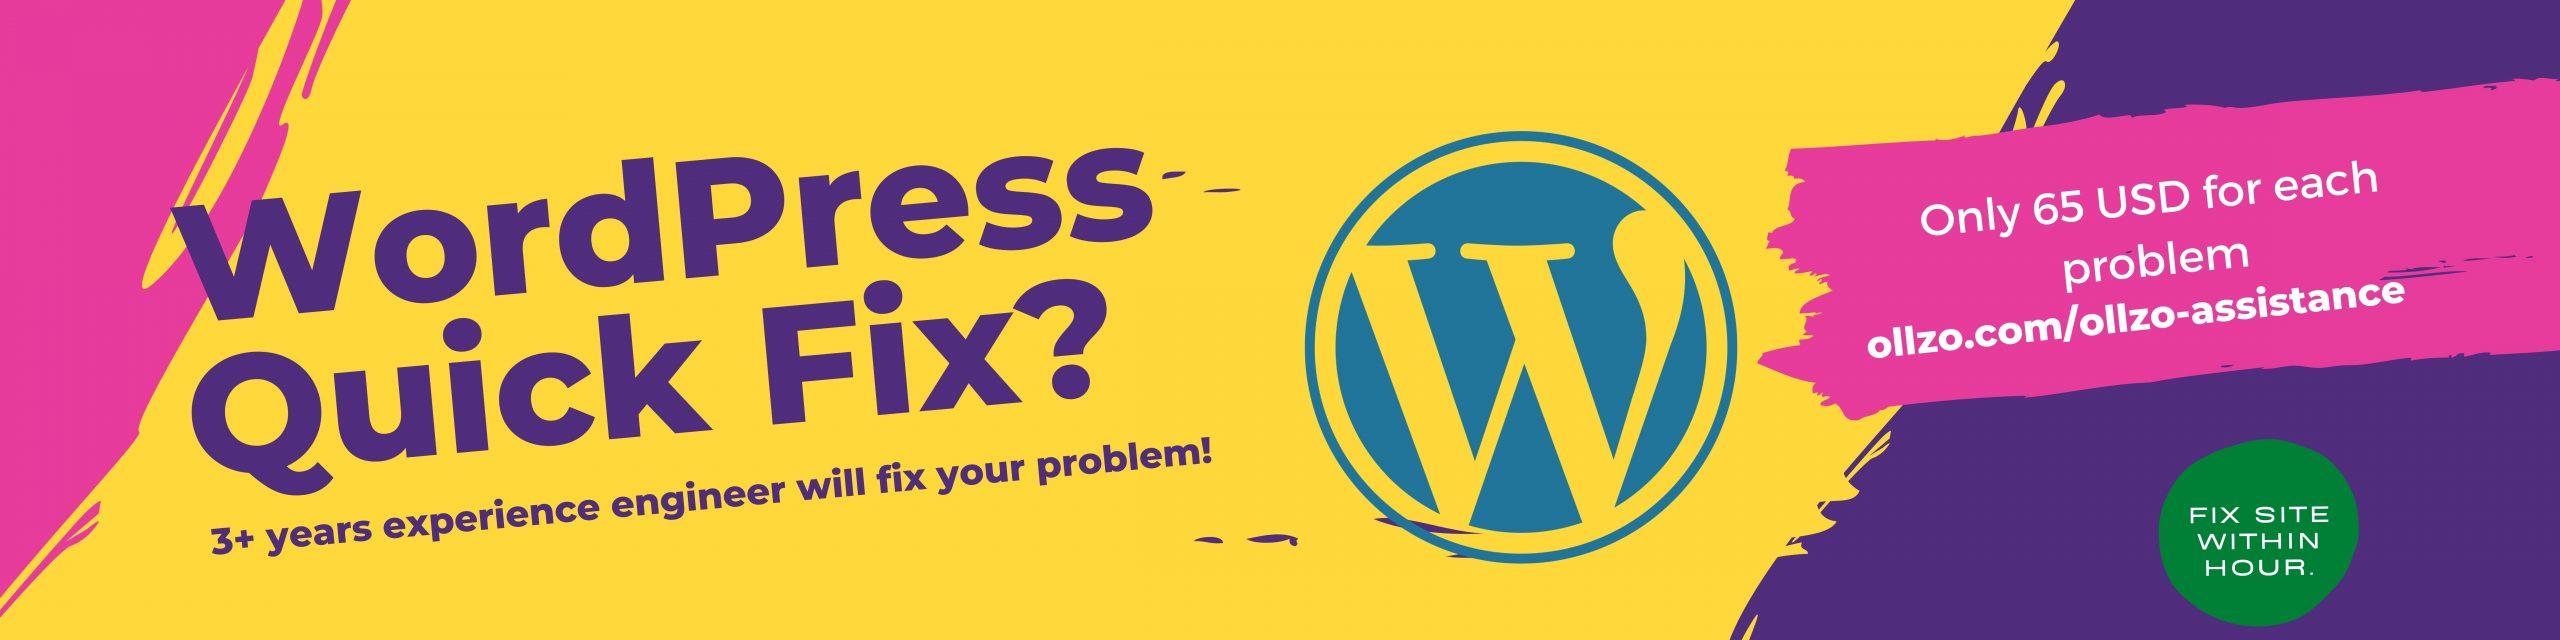 WordPress quick fix by ollzo